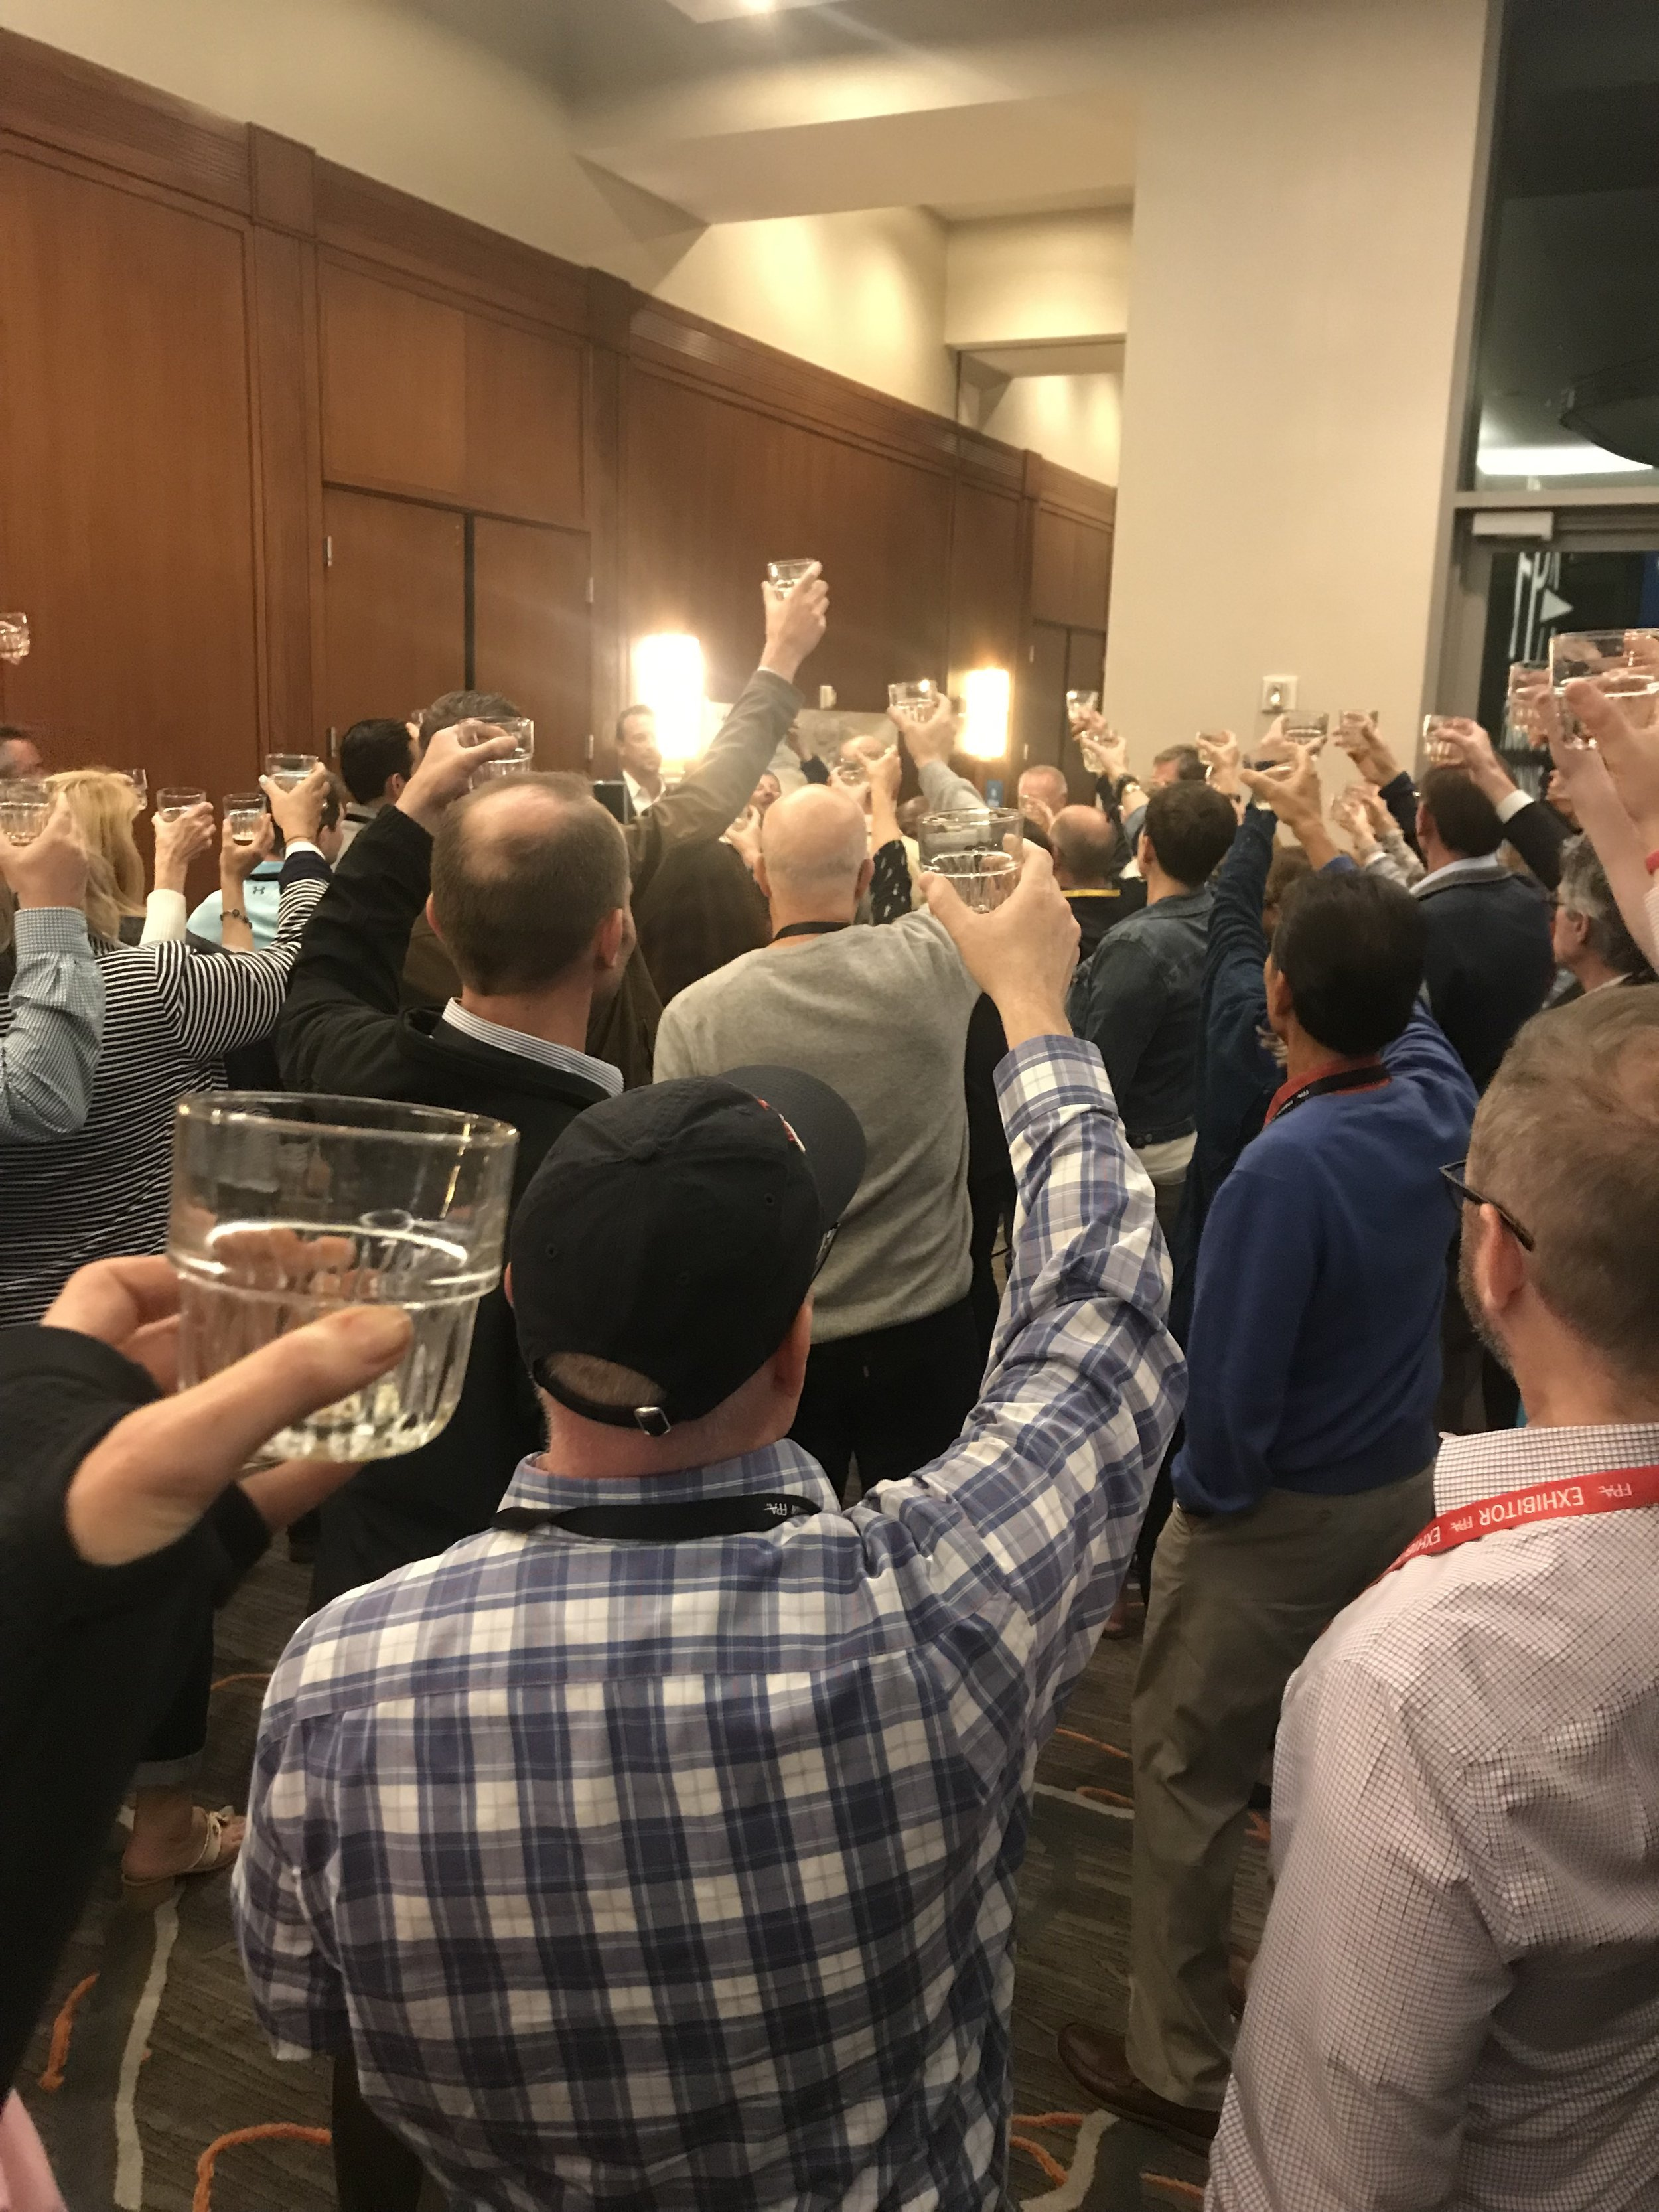 Whiskey tasting event